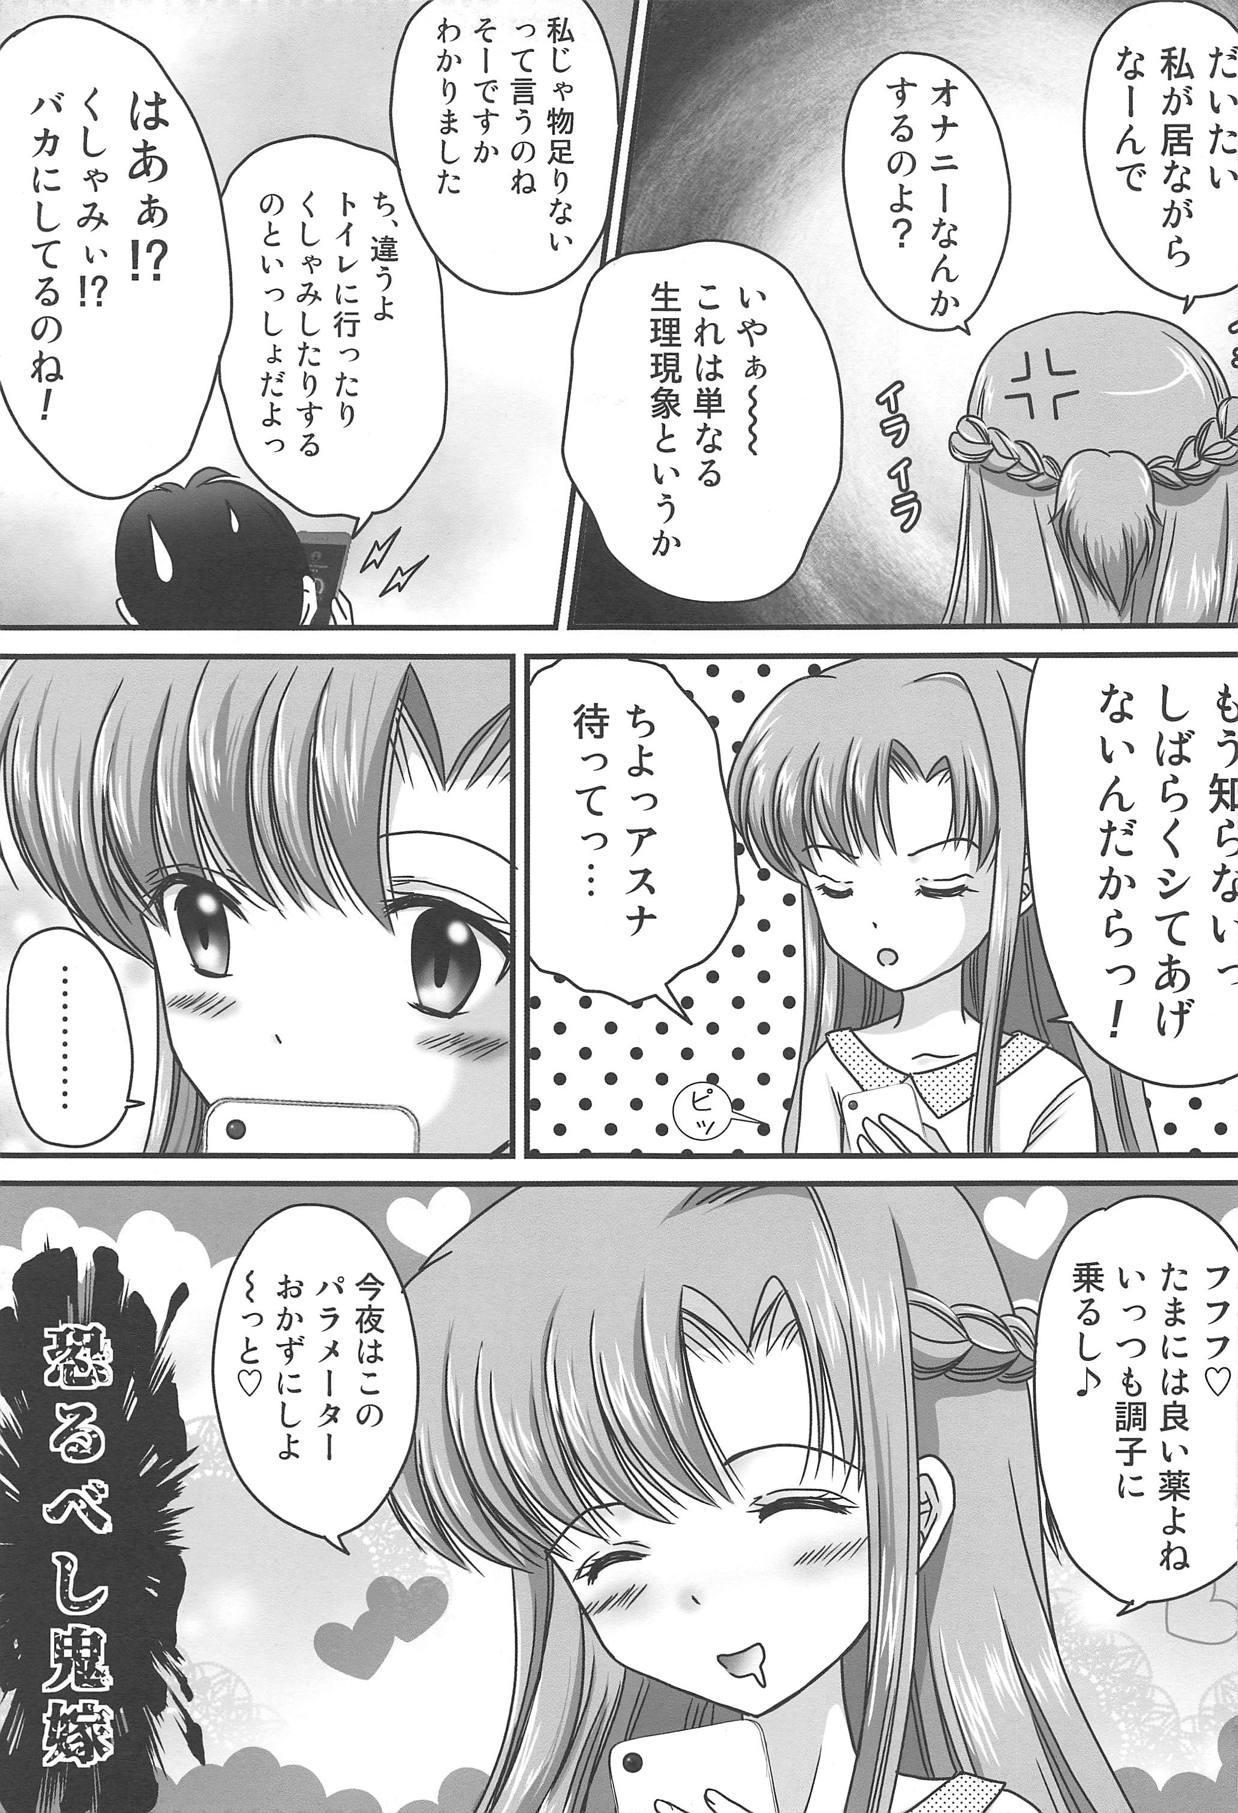 (C95) [TRAP (Urano Mami)] SAO ~sokoni anatato omoideto~ ETERNAL (Sword Art Online) 3